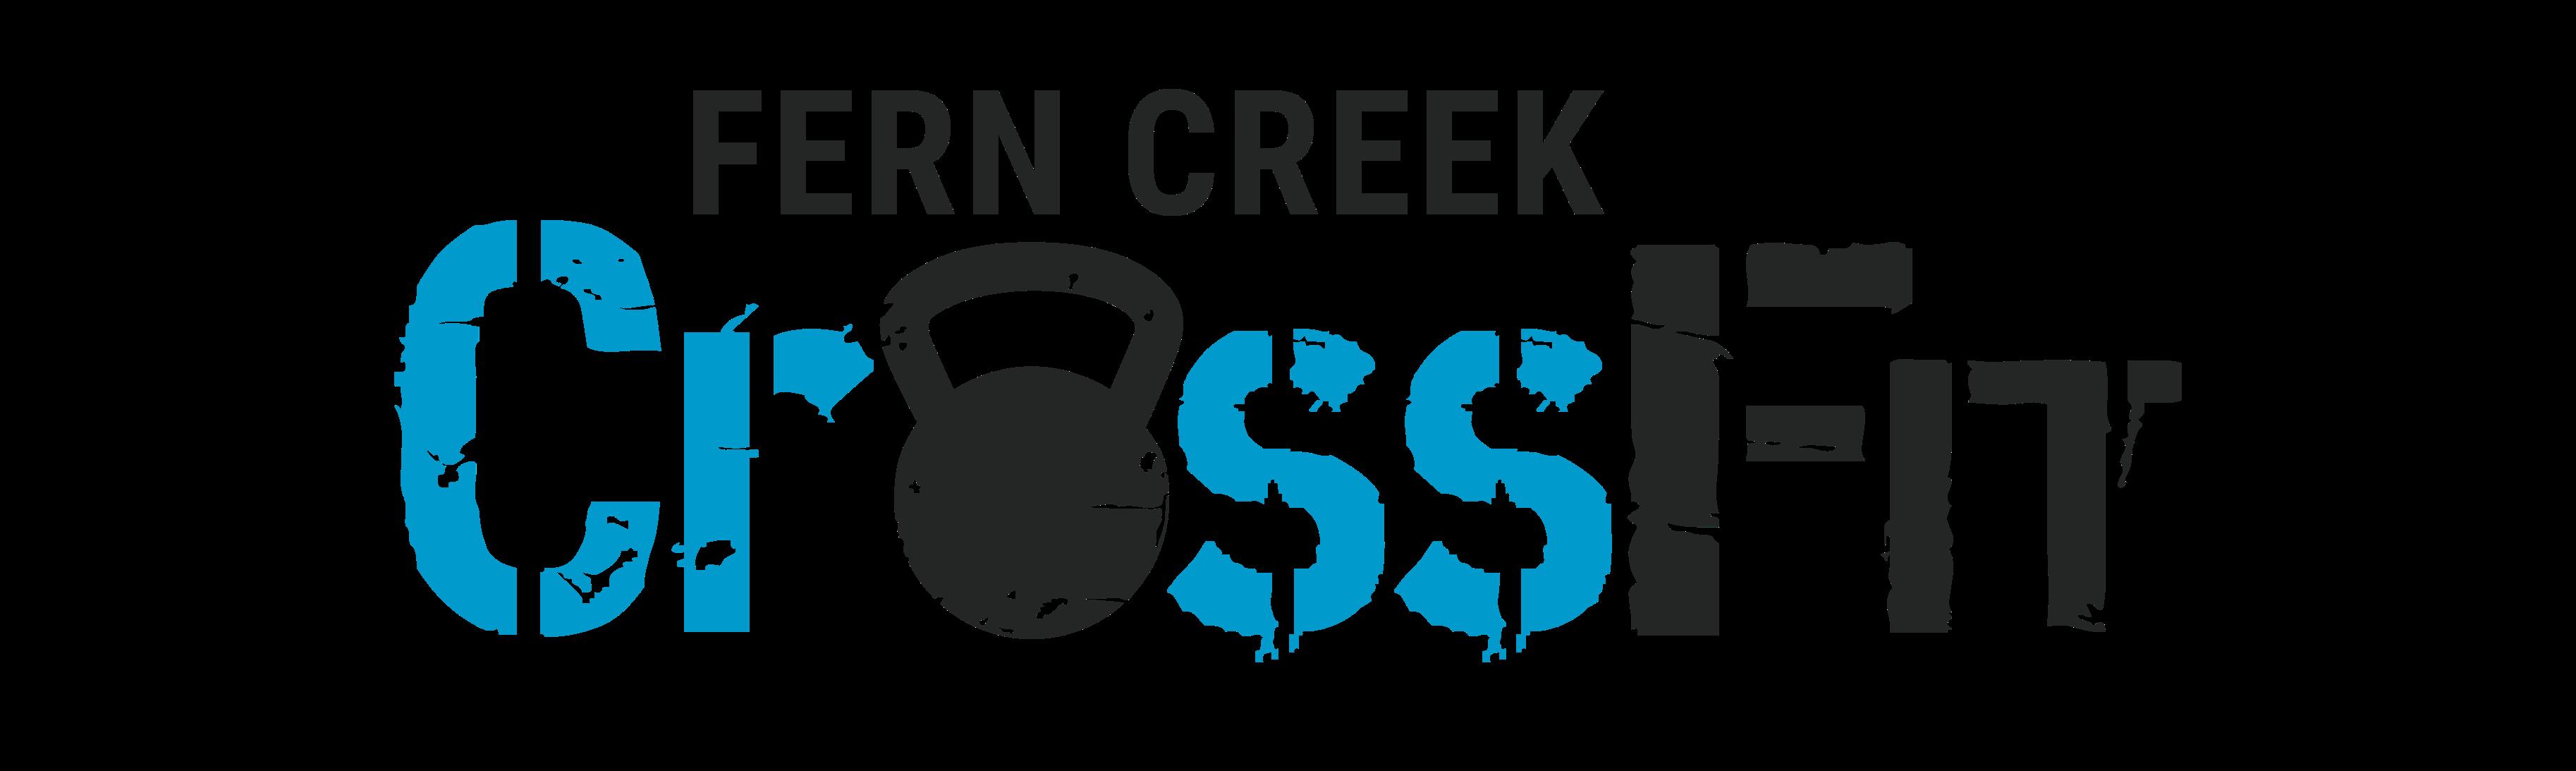 Fern creek crossfit branding. Kettlebell clipart svg